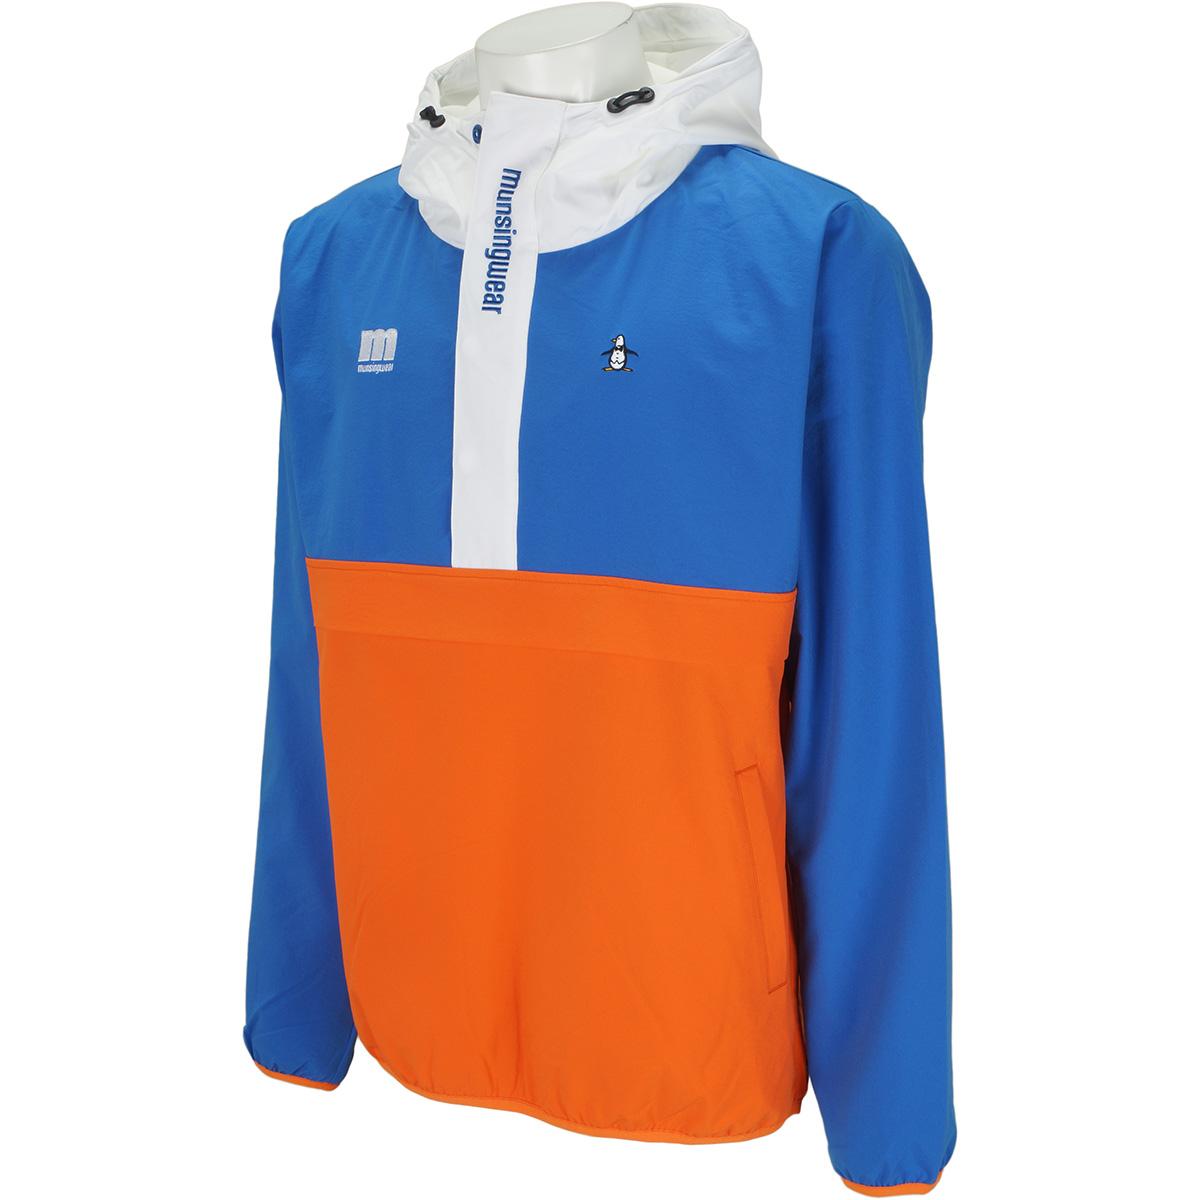 ENVOY 3カラー ストレッチ アノラックジャケット